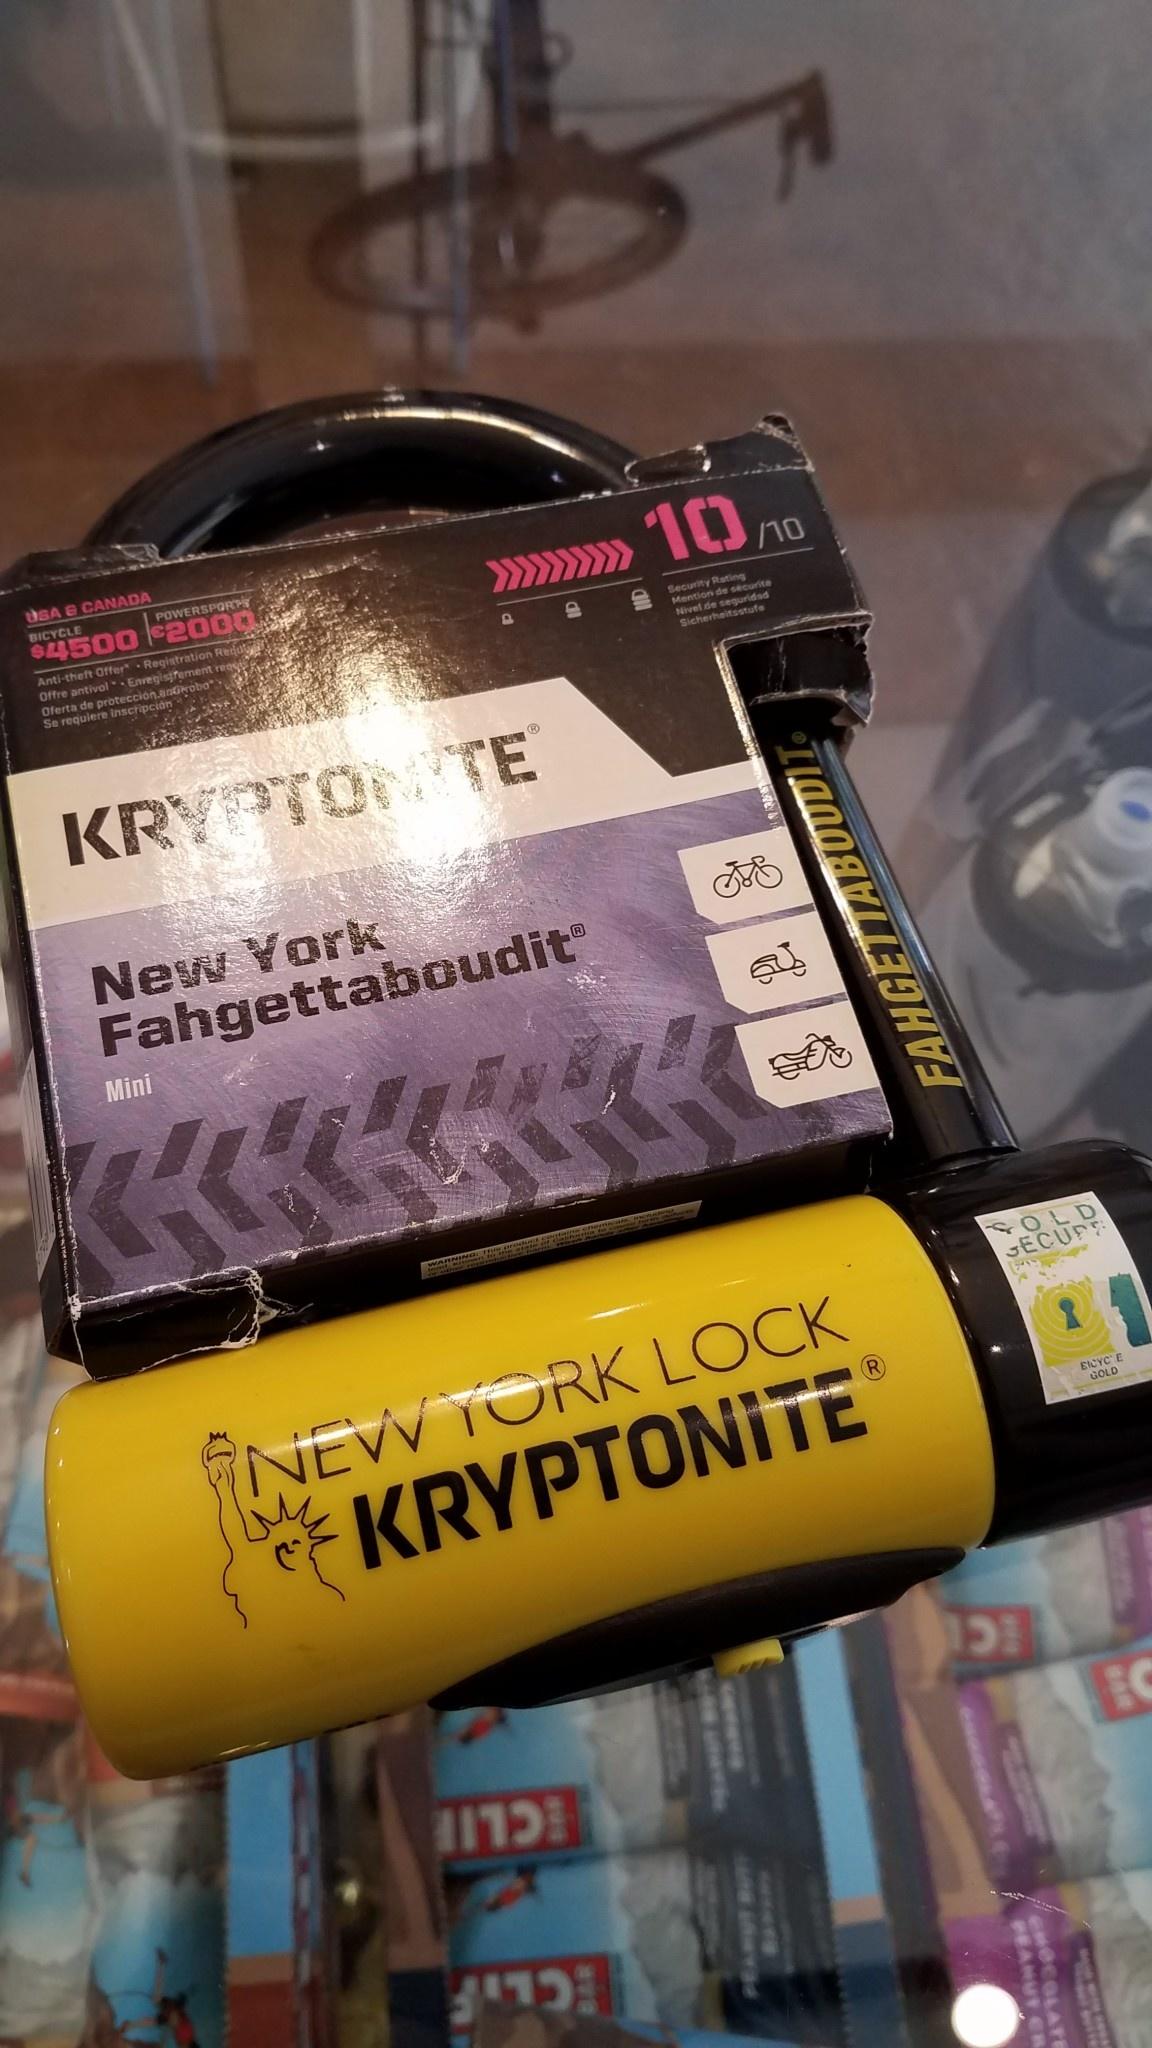 "Kryptonite New York U-Lock - 3.25 x 6"", Keyed, Black"